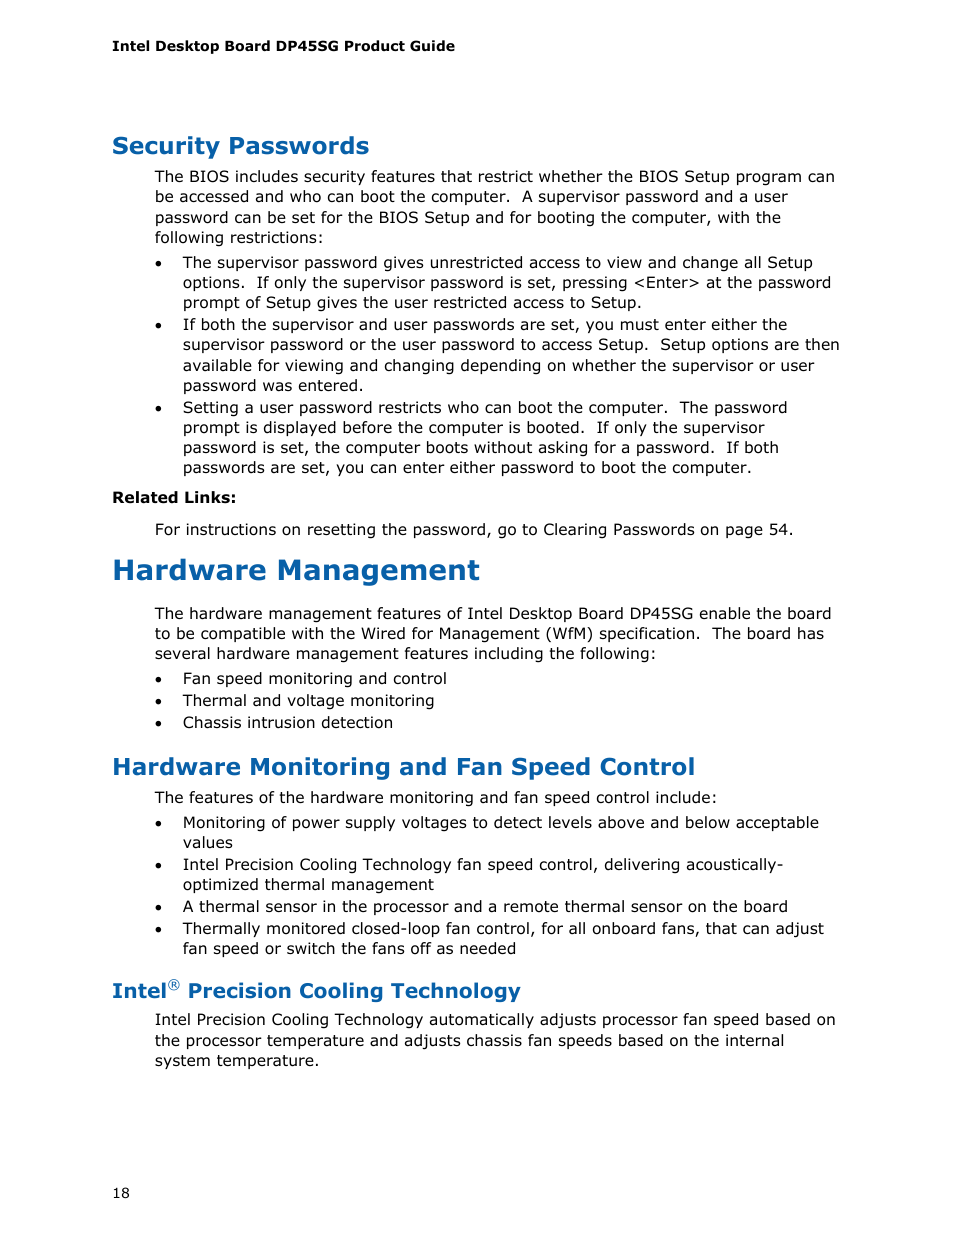 Security passwords, Hardware management, Hardware monitoring